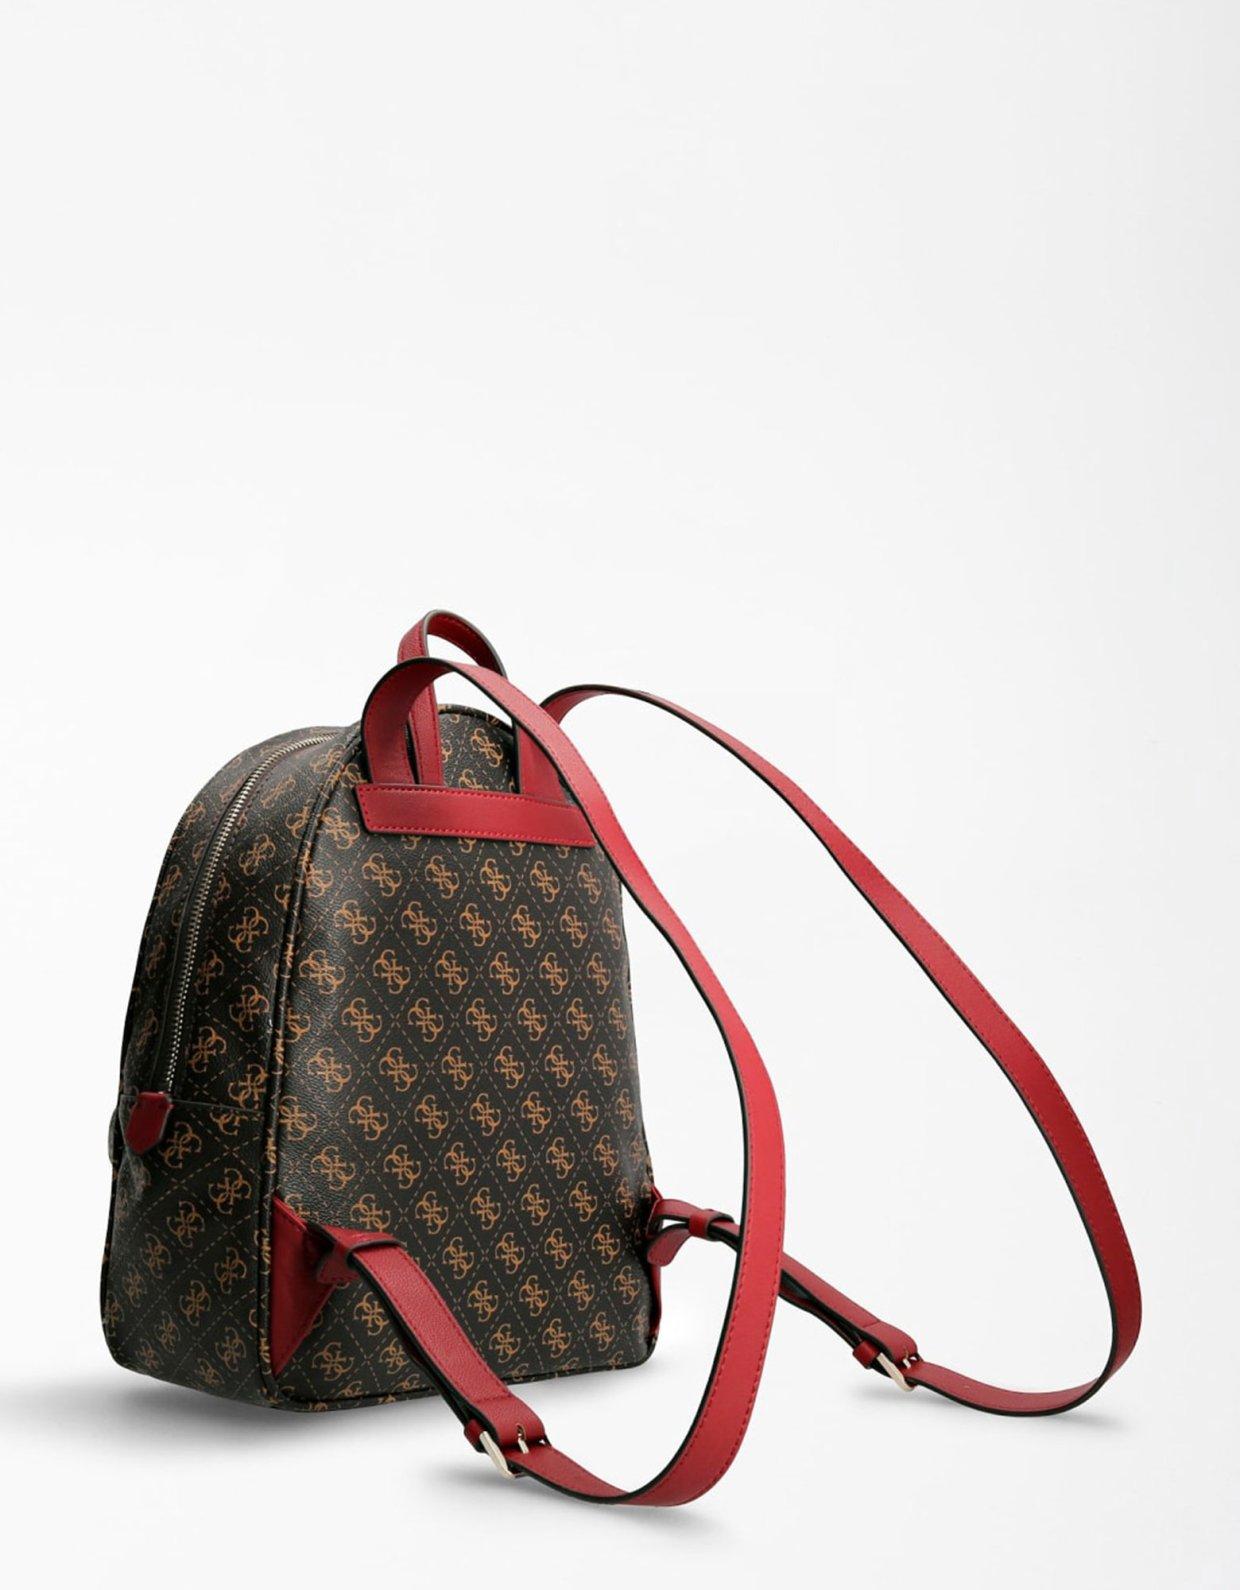 Guess Vikky 4G logo backpack brown/merlot